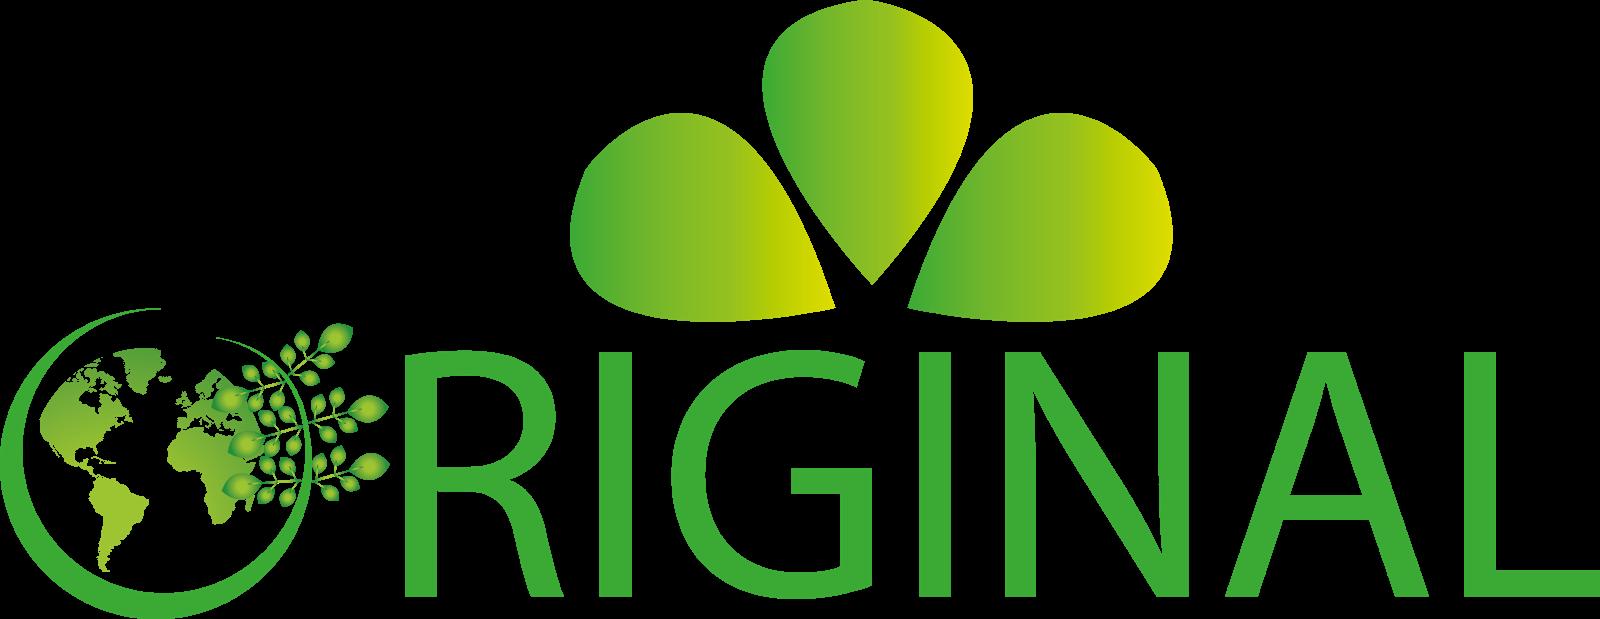 اوريجينال لتصدير اعشاب طبية; توابل و بذور Dried Herbs & Spices , Seeds